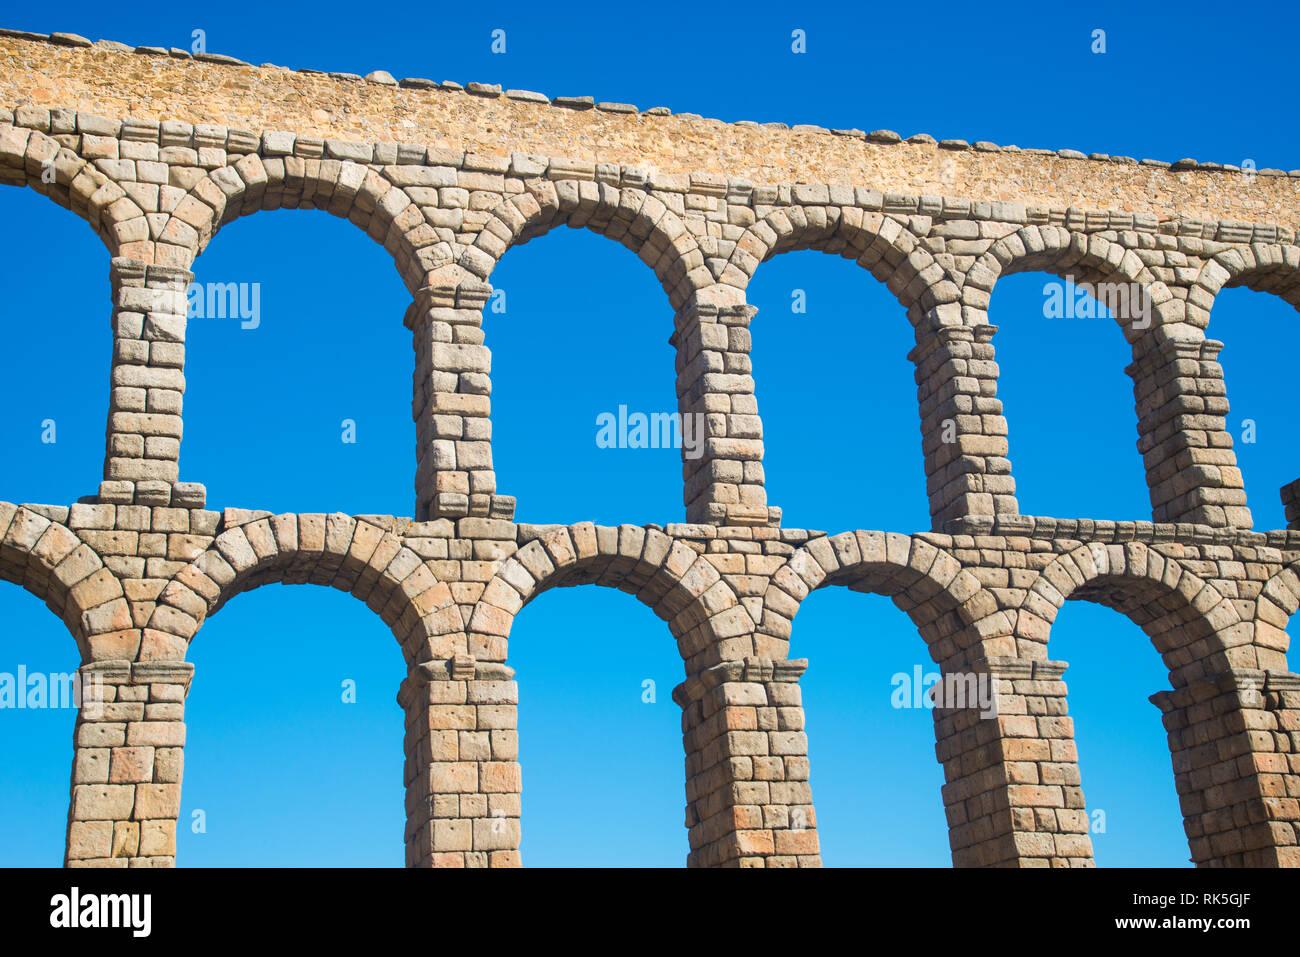 Roman aqueduct. Segovia, Spain. - Stock Image